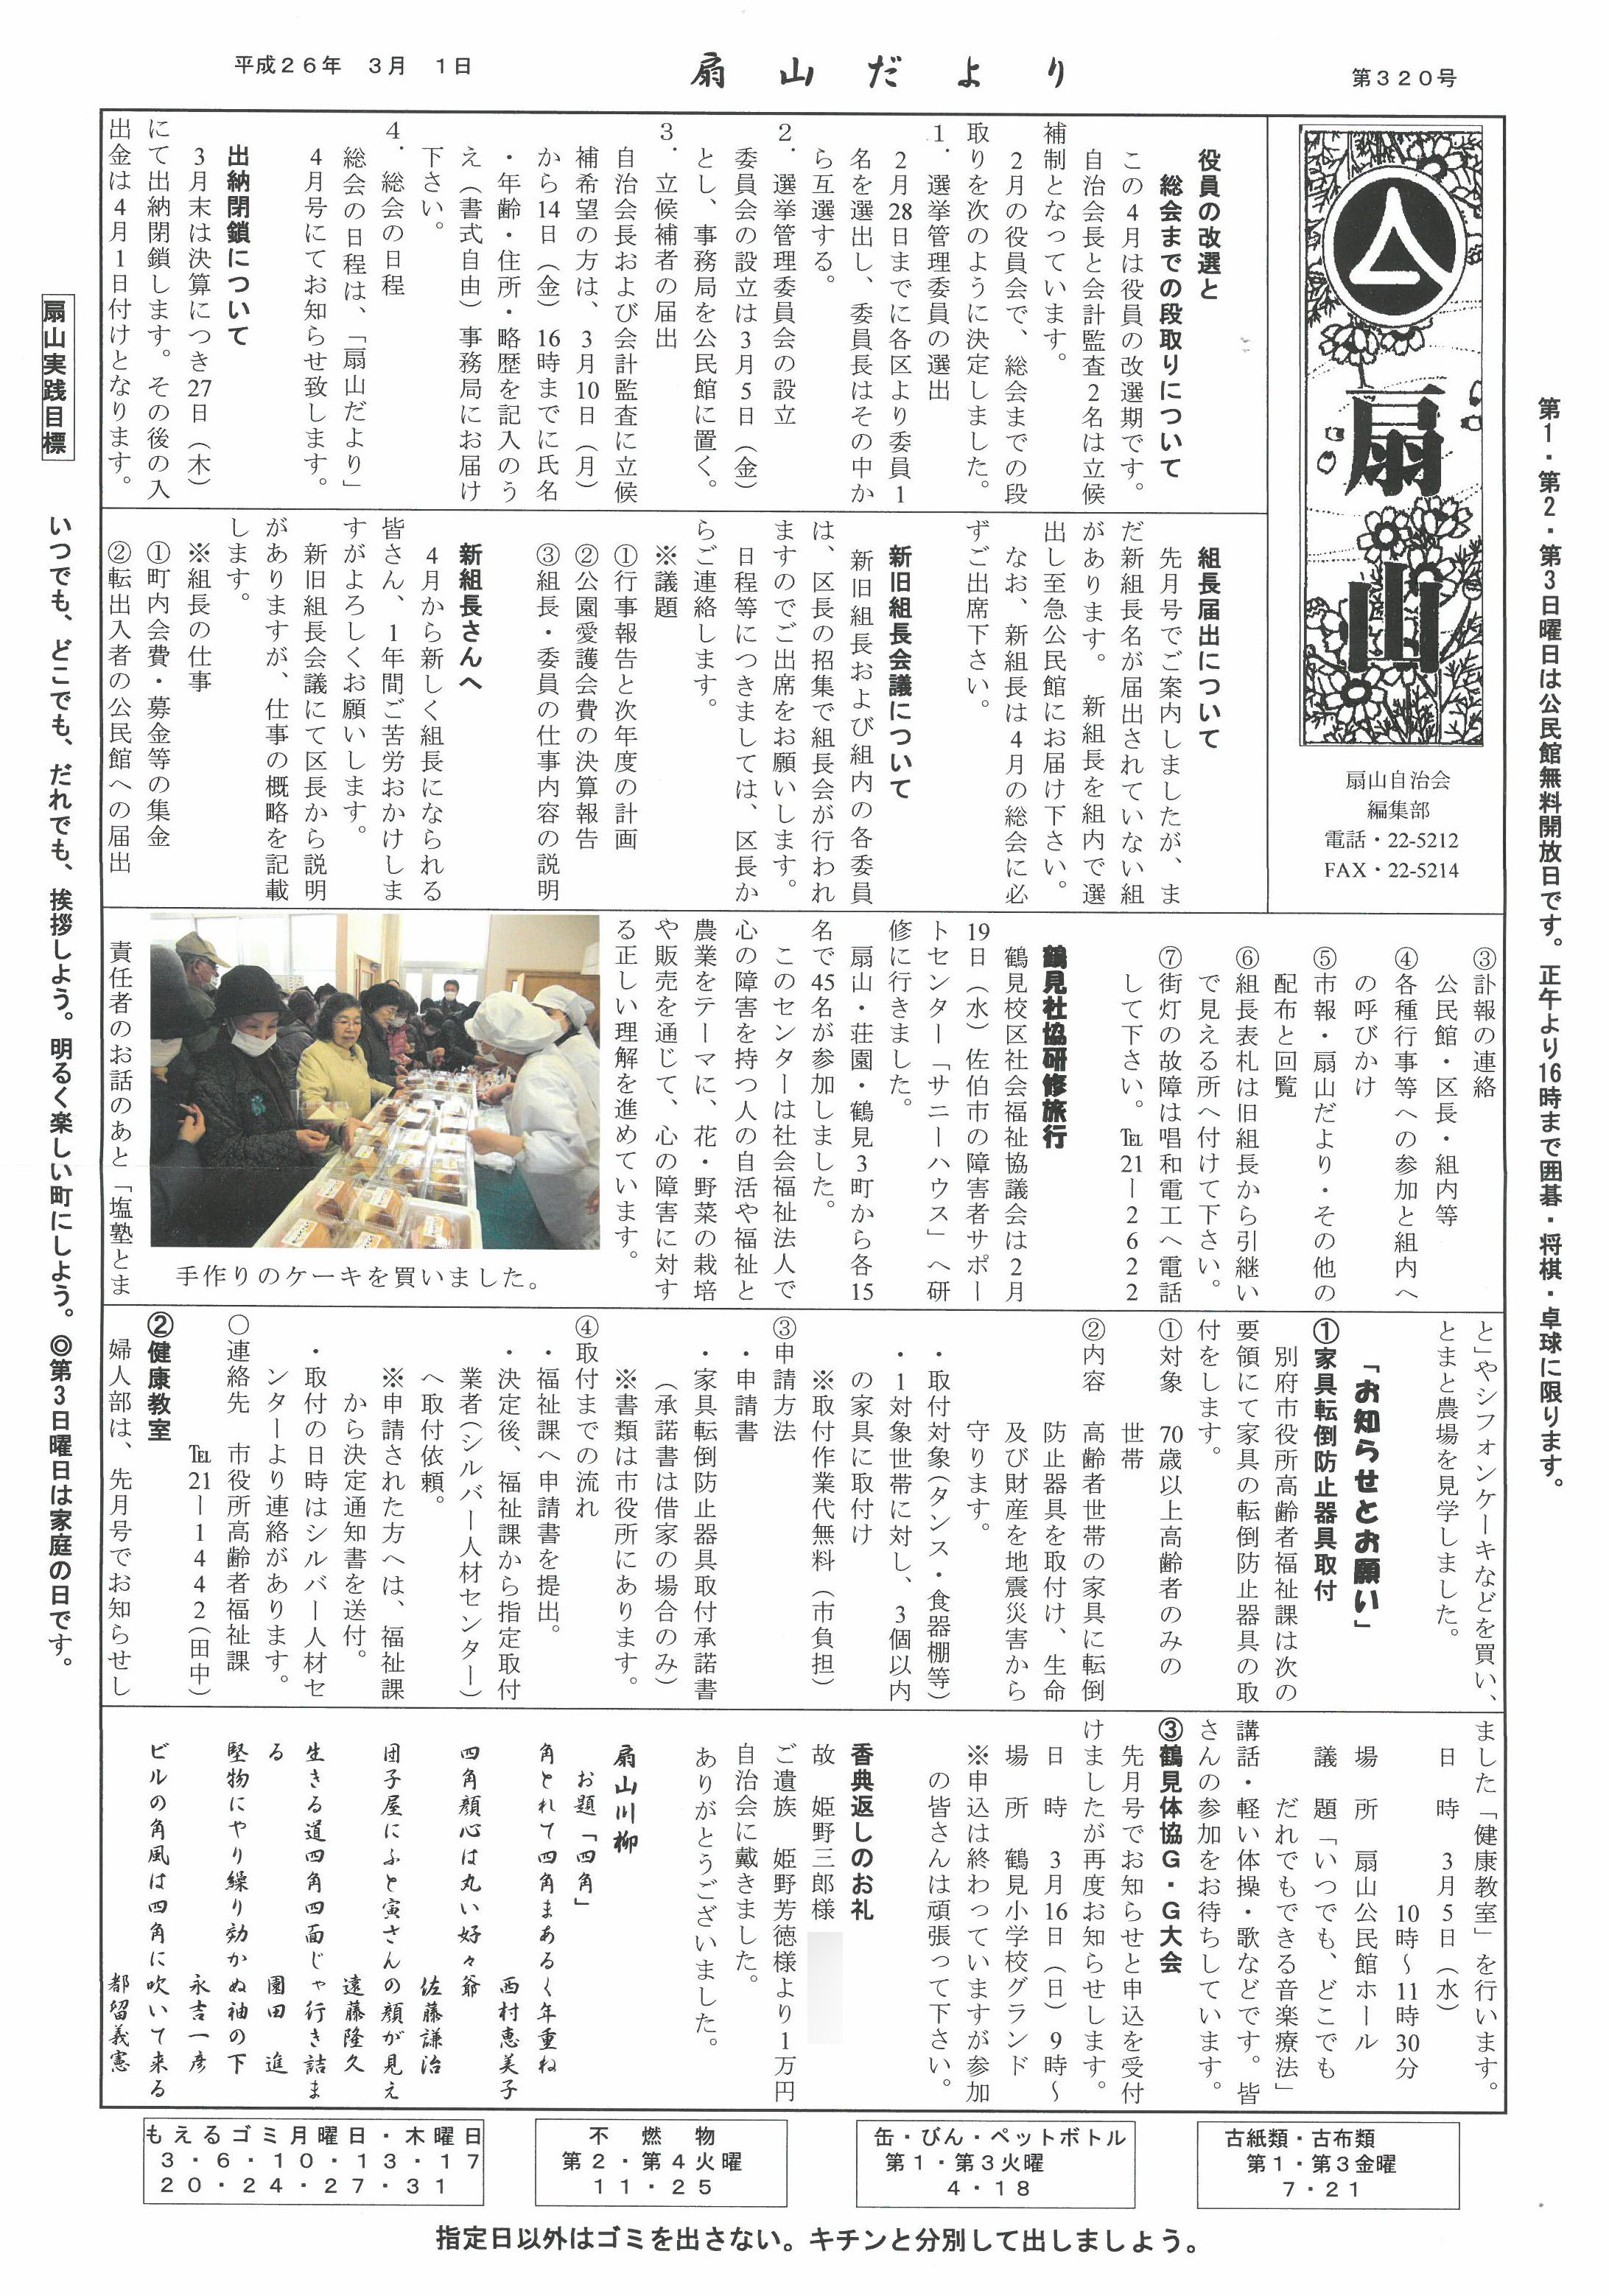 ogiyama2014_03